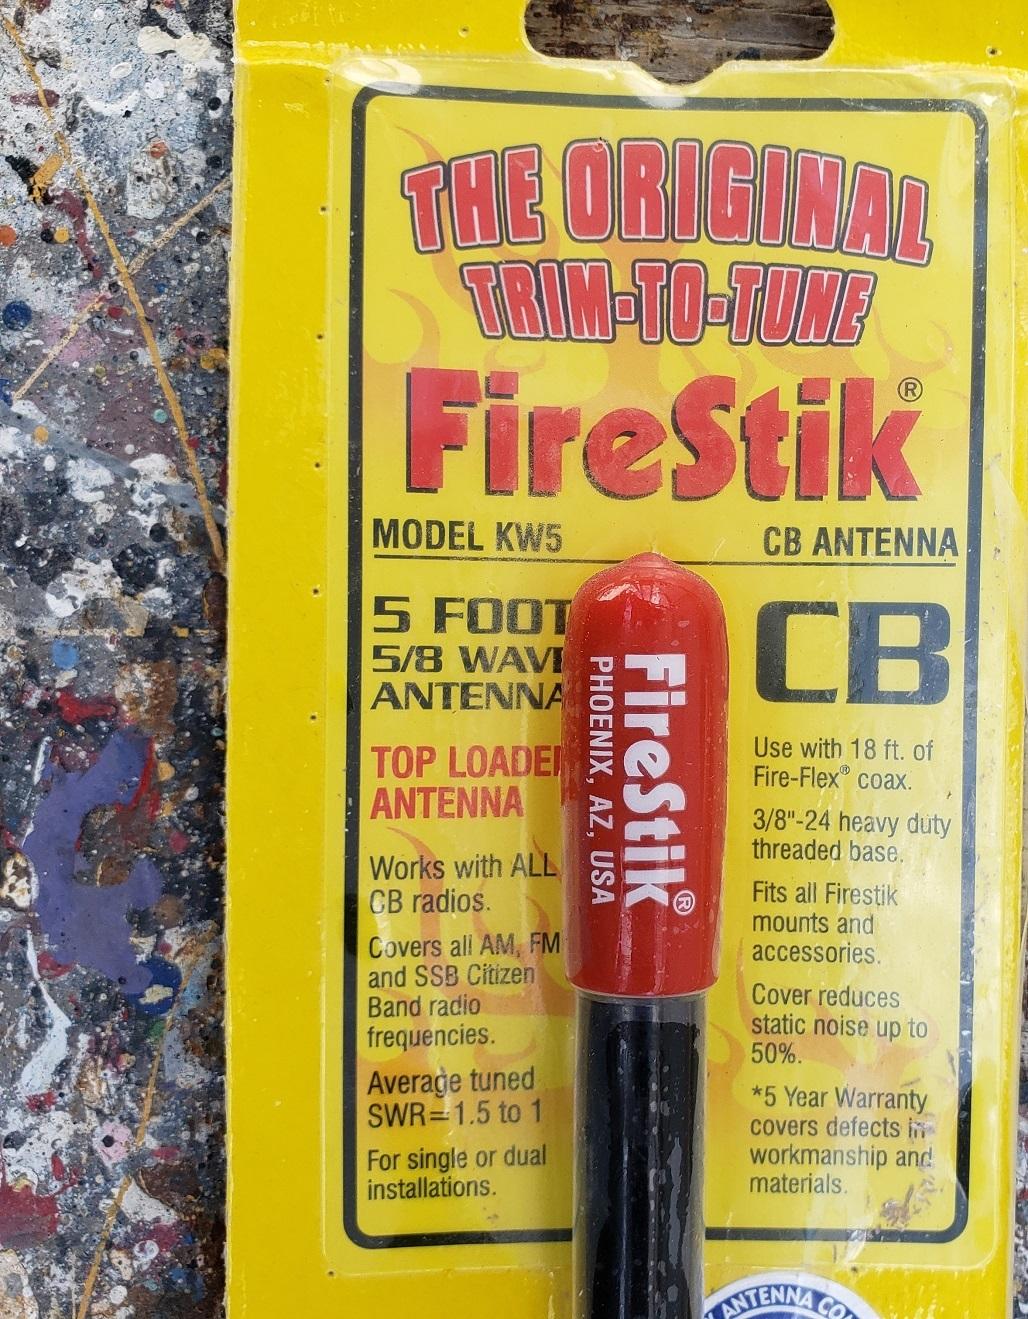 Firestick Antenna (BLACK) 5FT - Trim to Tune CB Antenna